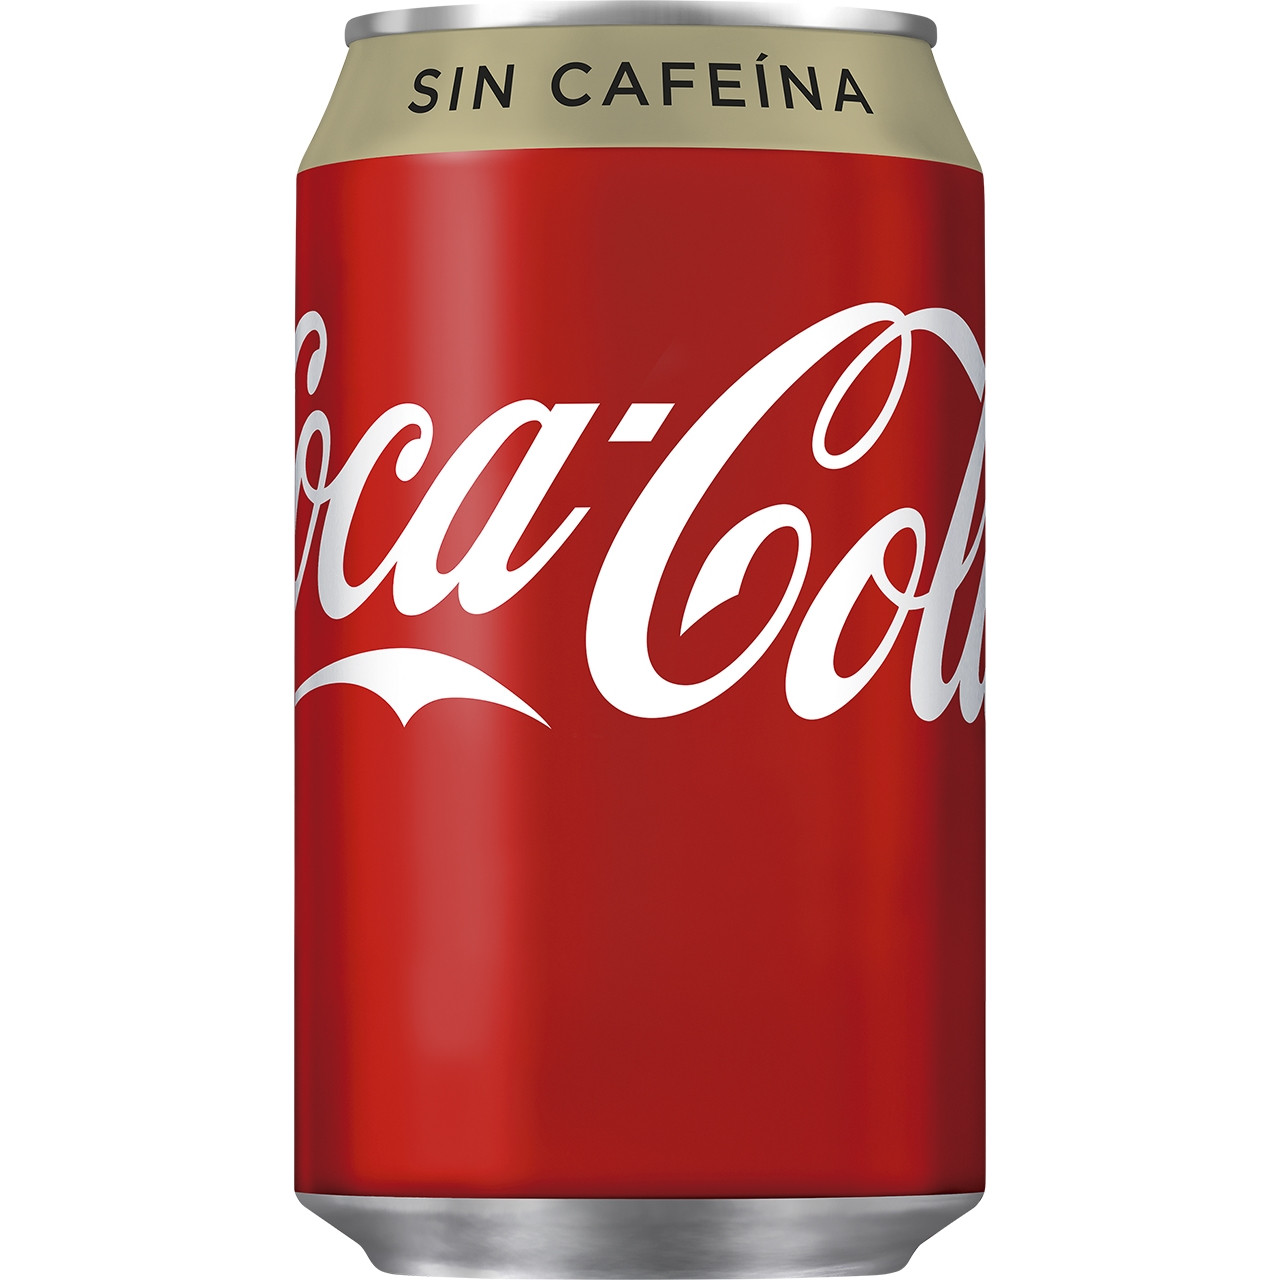 Llauna coca cola s cafeina 24u